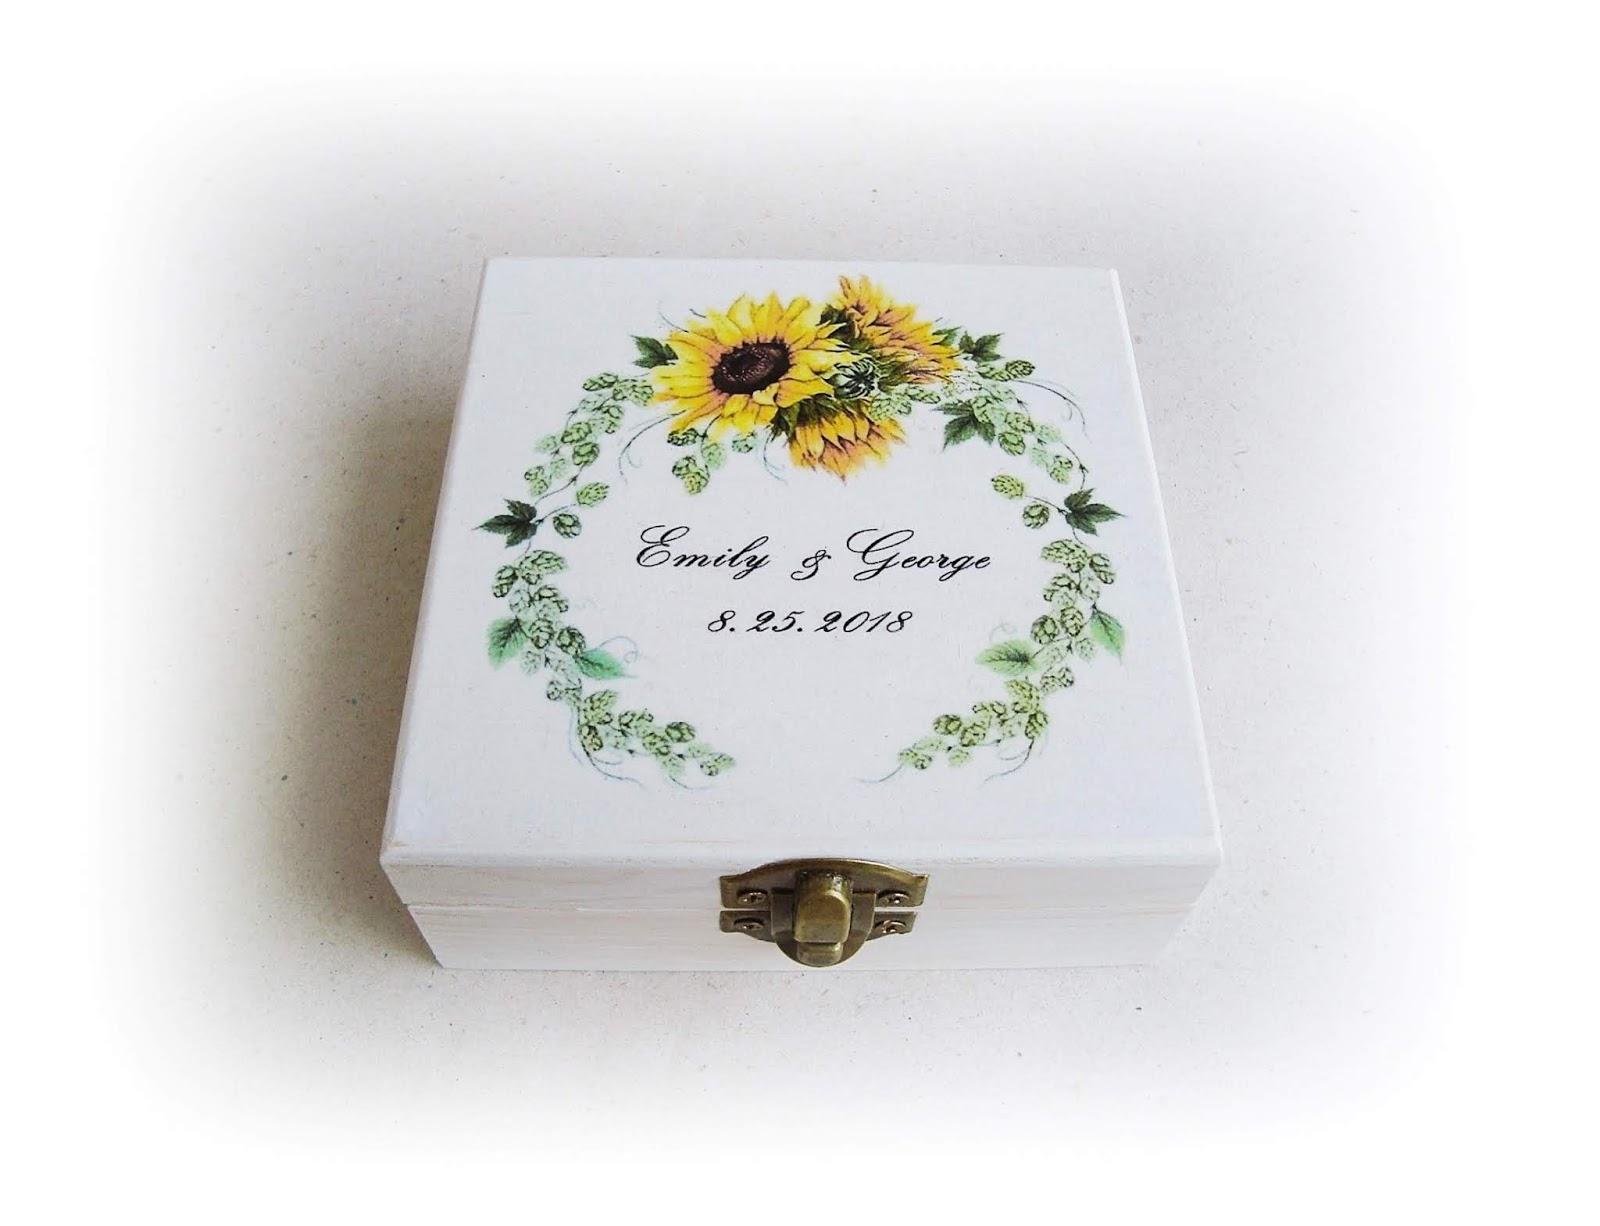 Wedding Ring Boxes - Gift Idea: Sunflower Wedding Rings Box ...